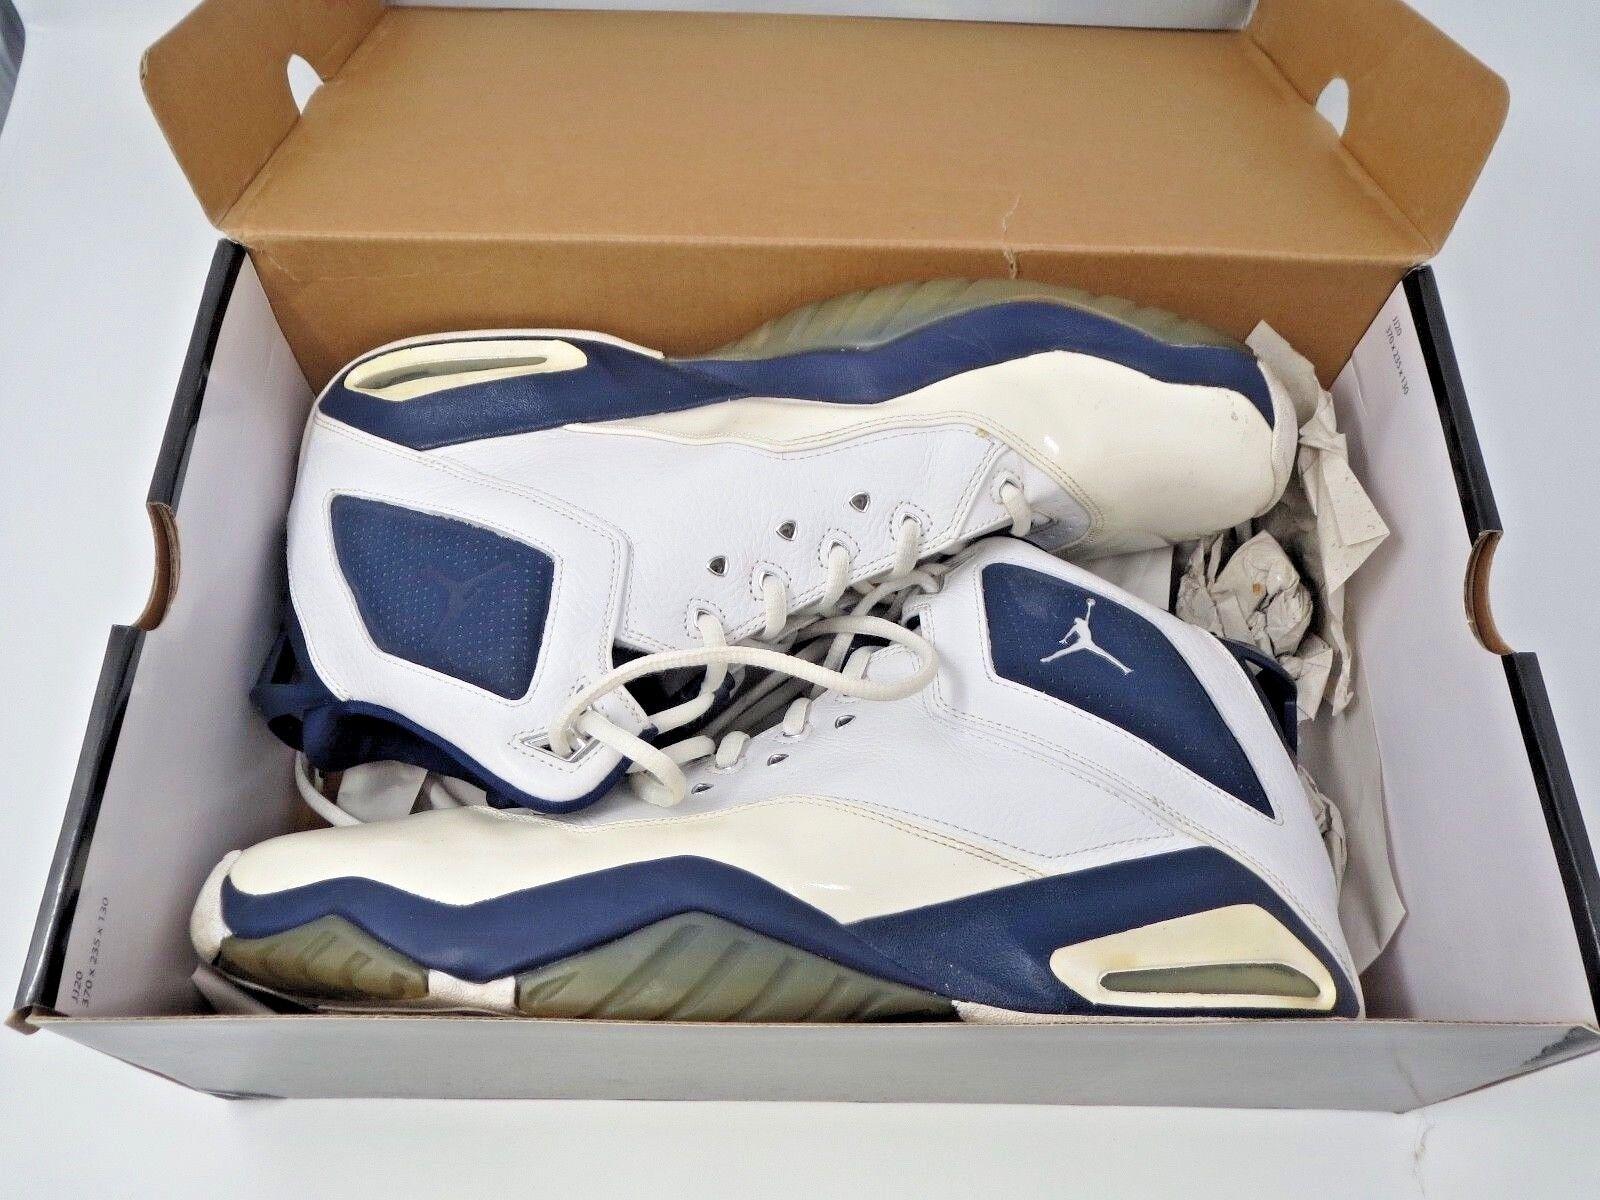 • Nike Air Jordan • B'Loyal • White Navy • Size 14 •